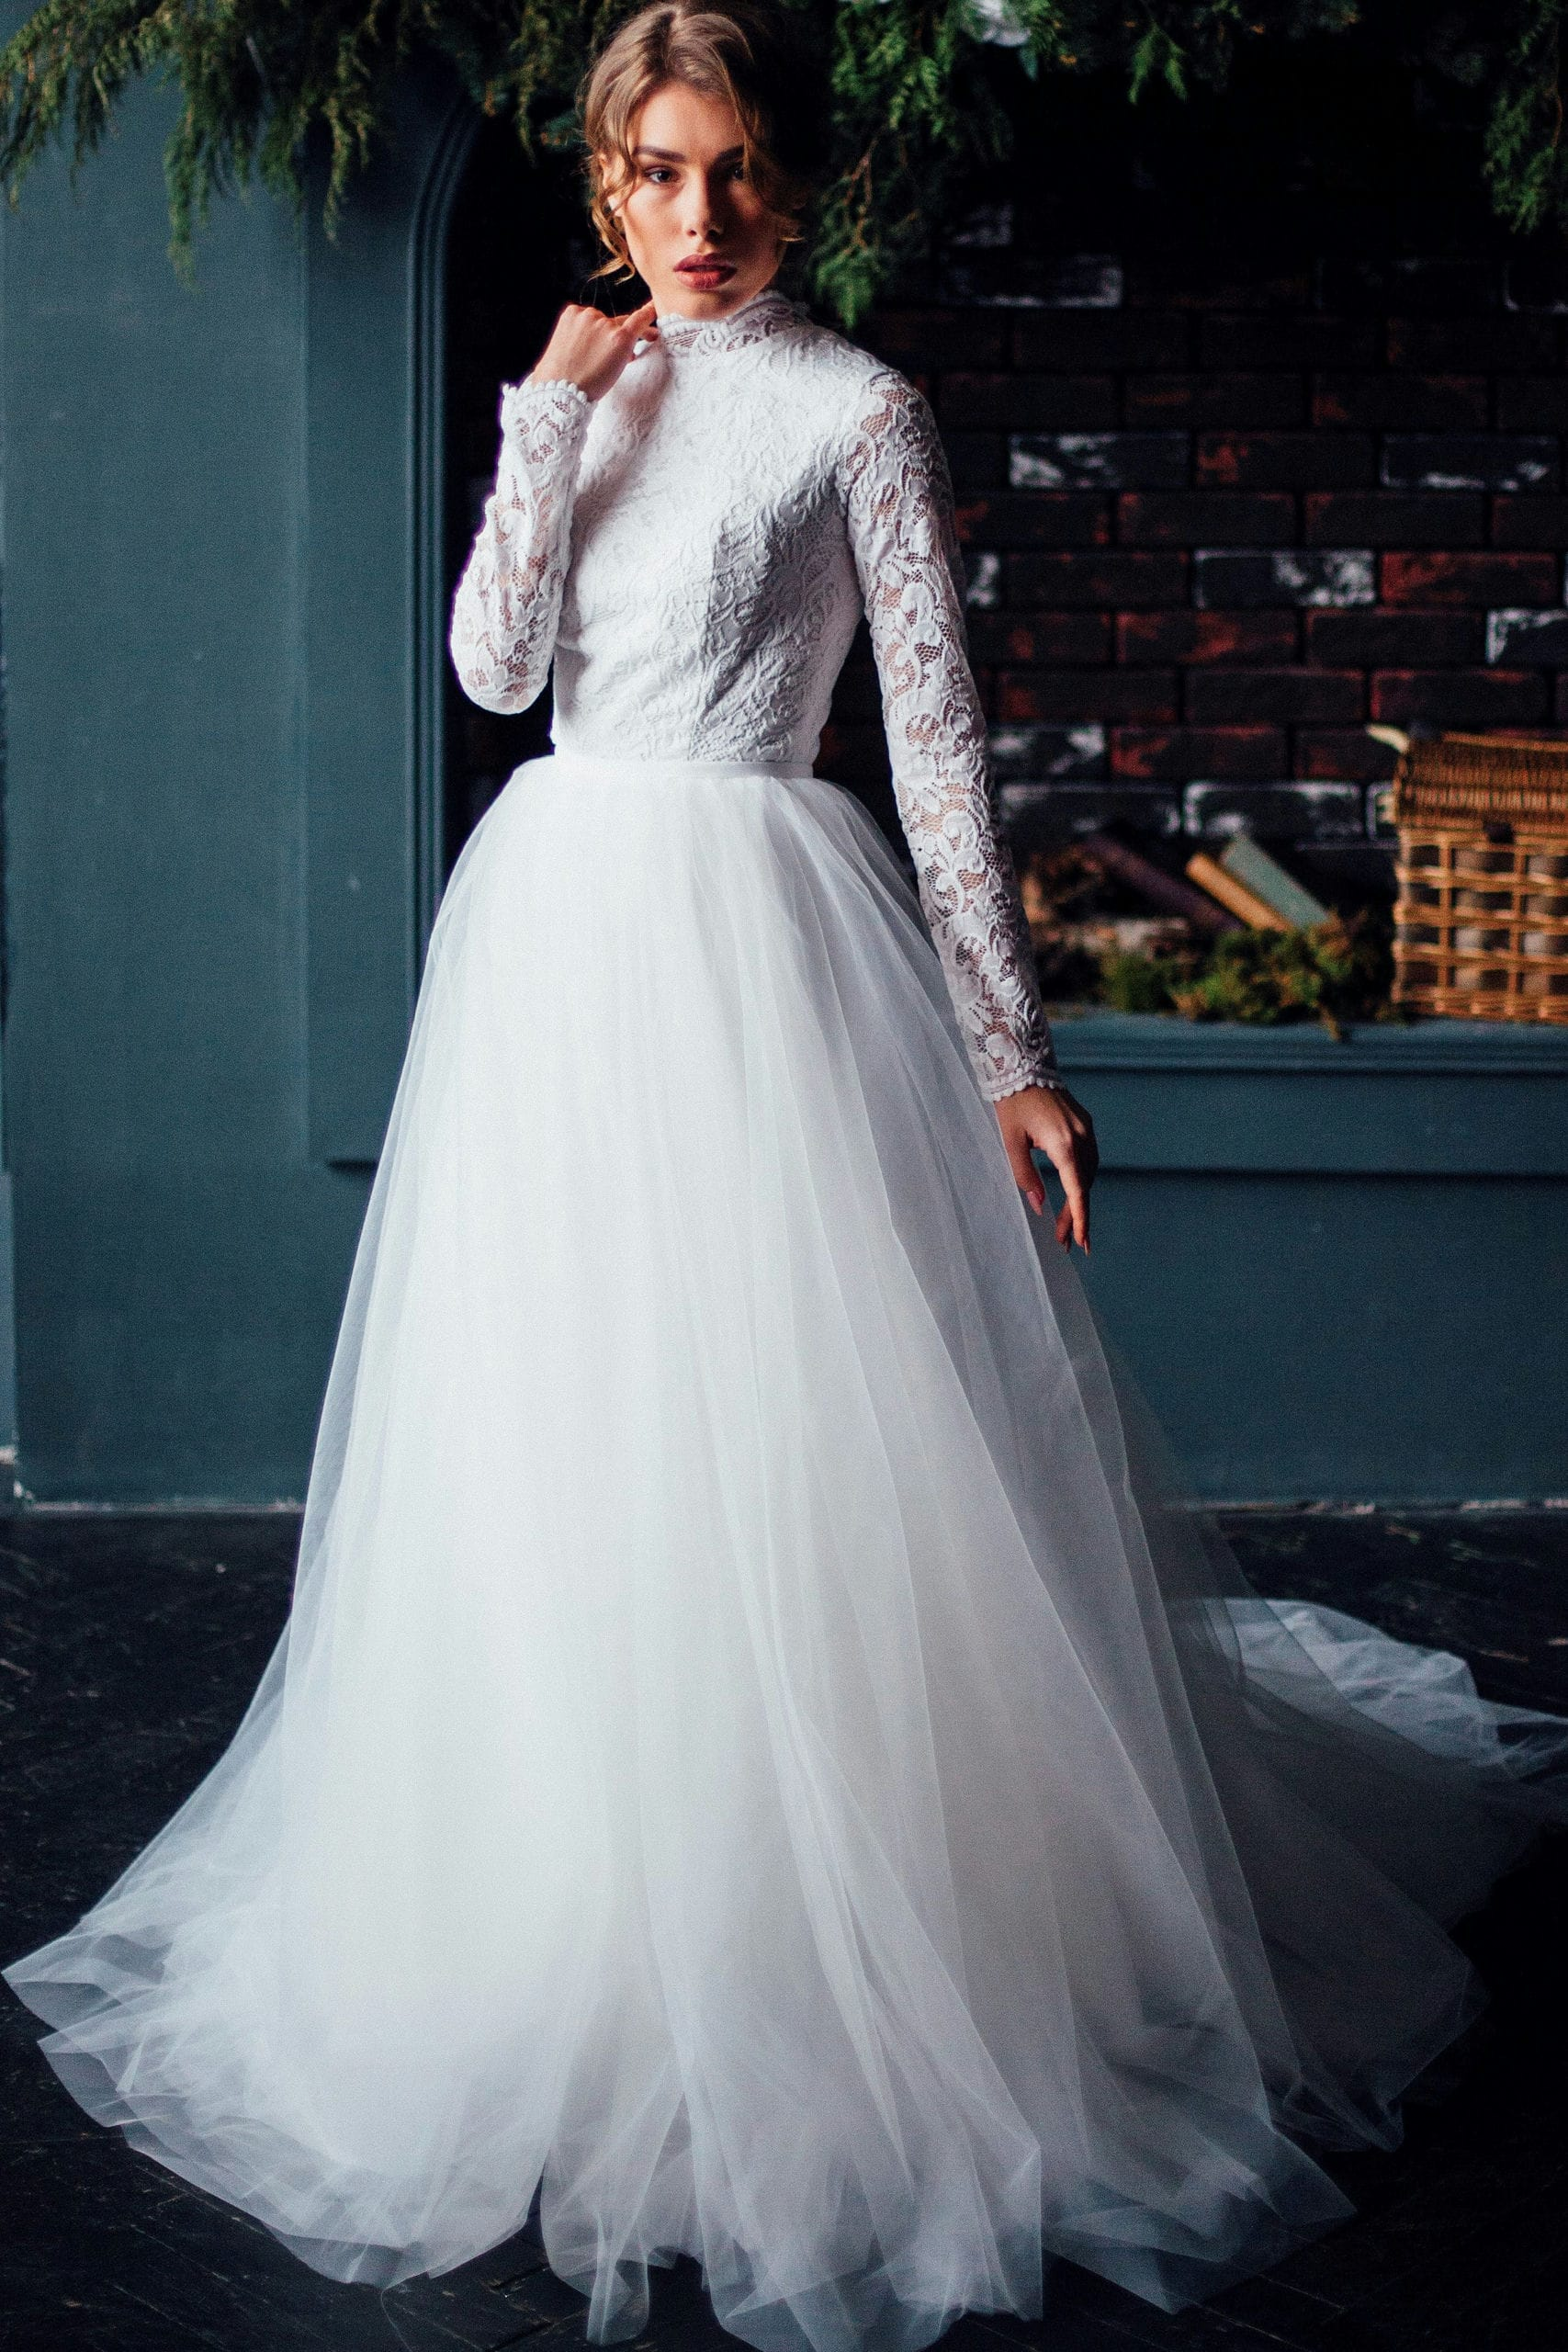 Свадебное платье CHRISTINE, коллекция THE ABSOLUTE LOVE, бренд RARE BRIDAL, фото 2